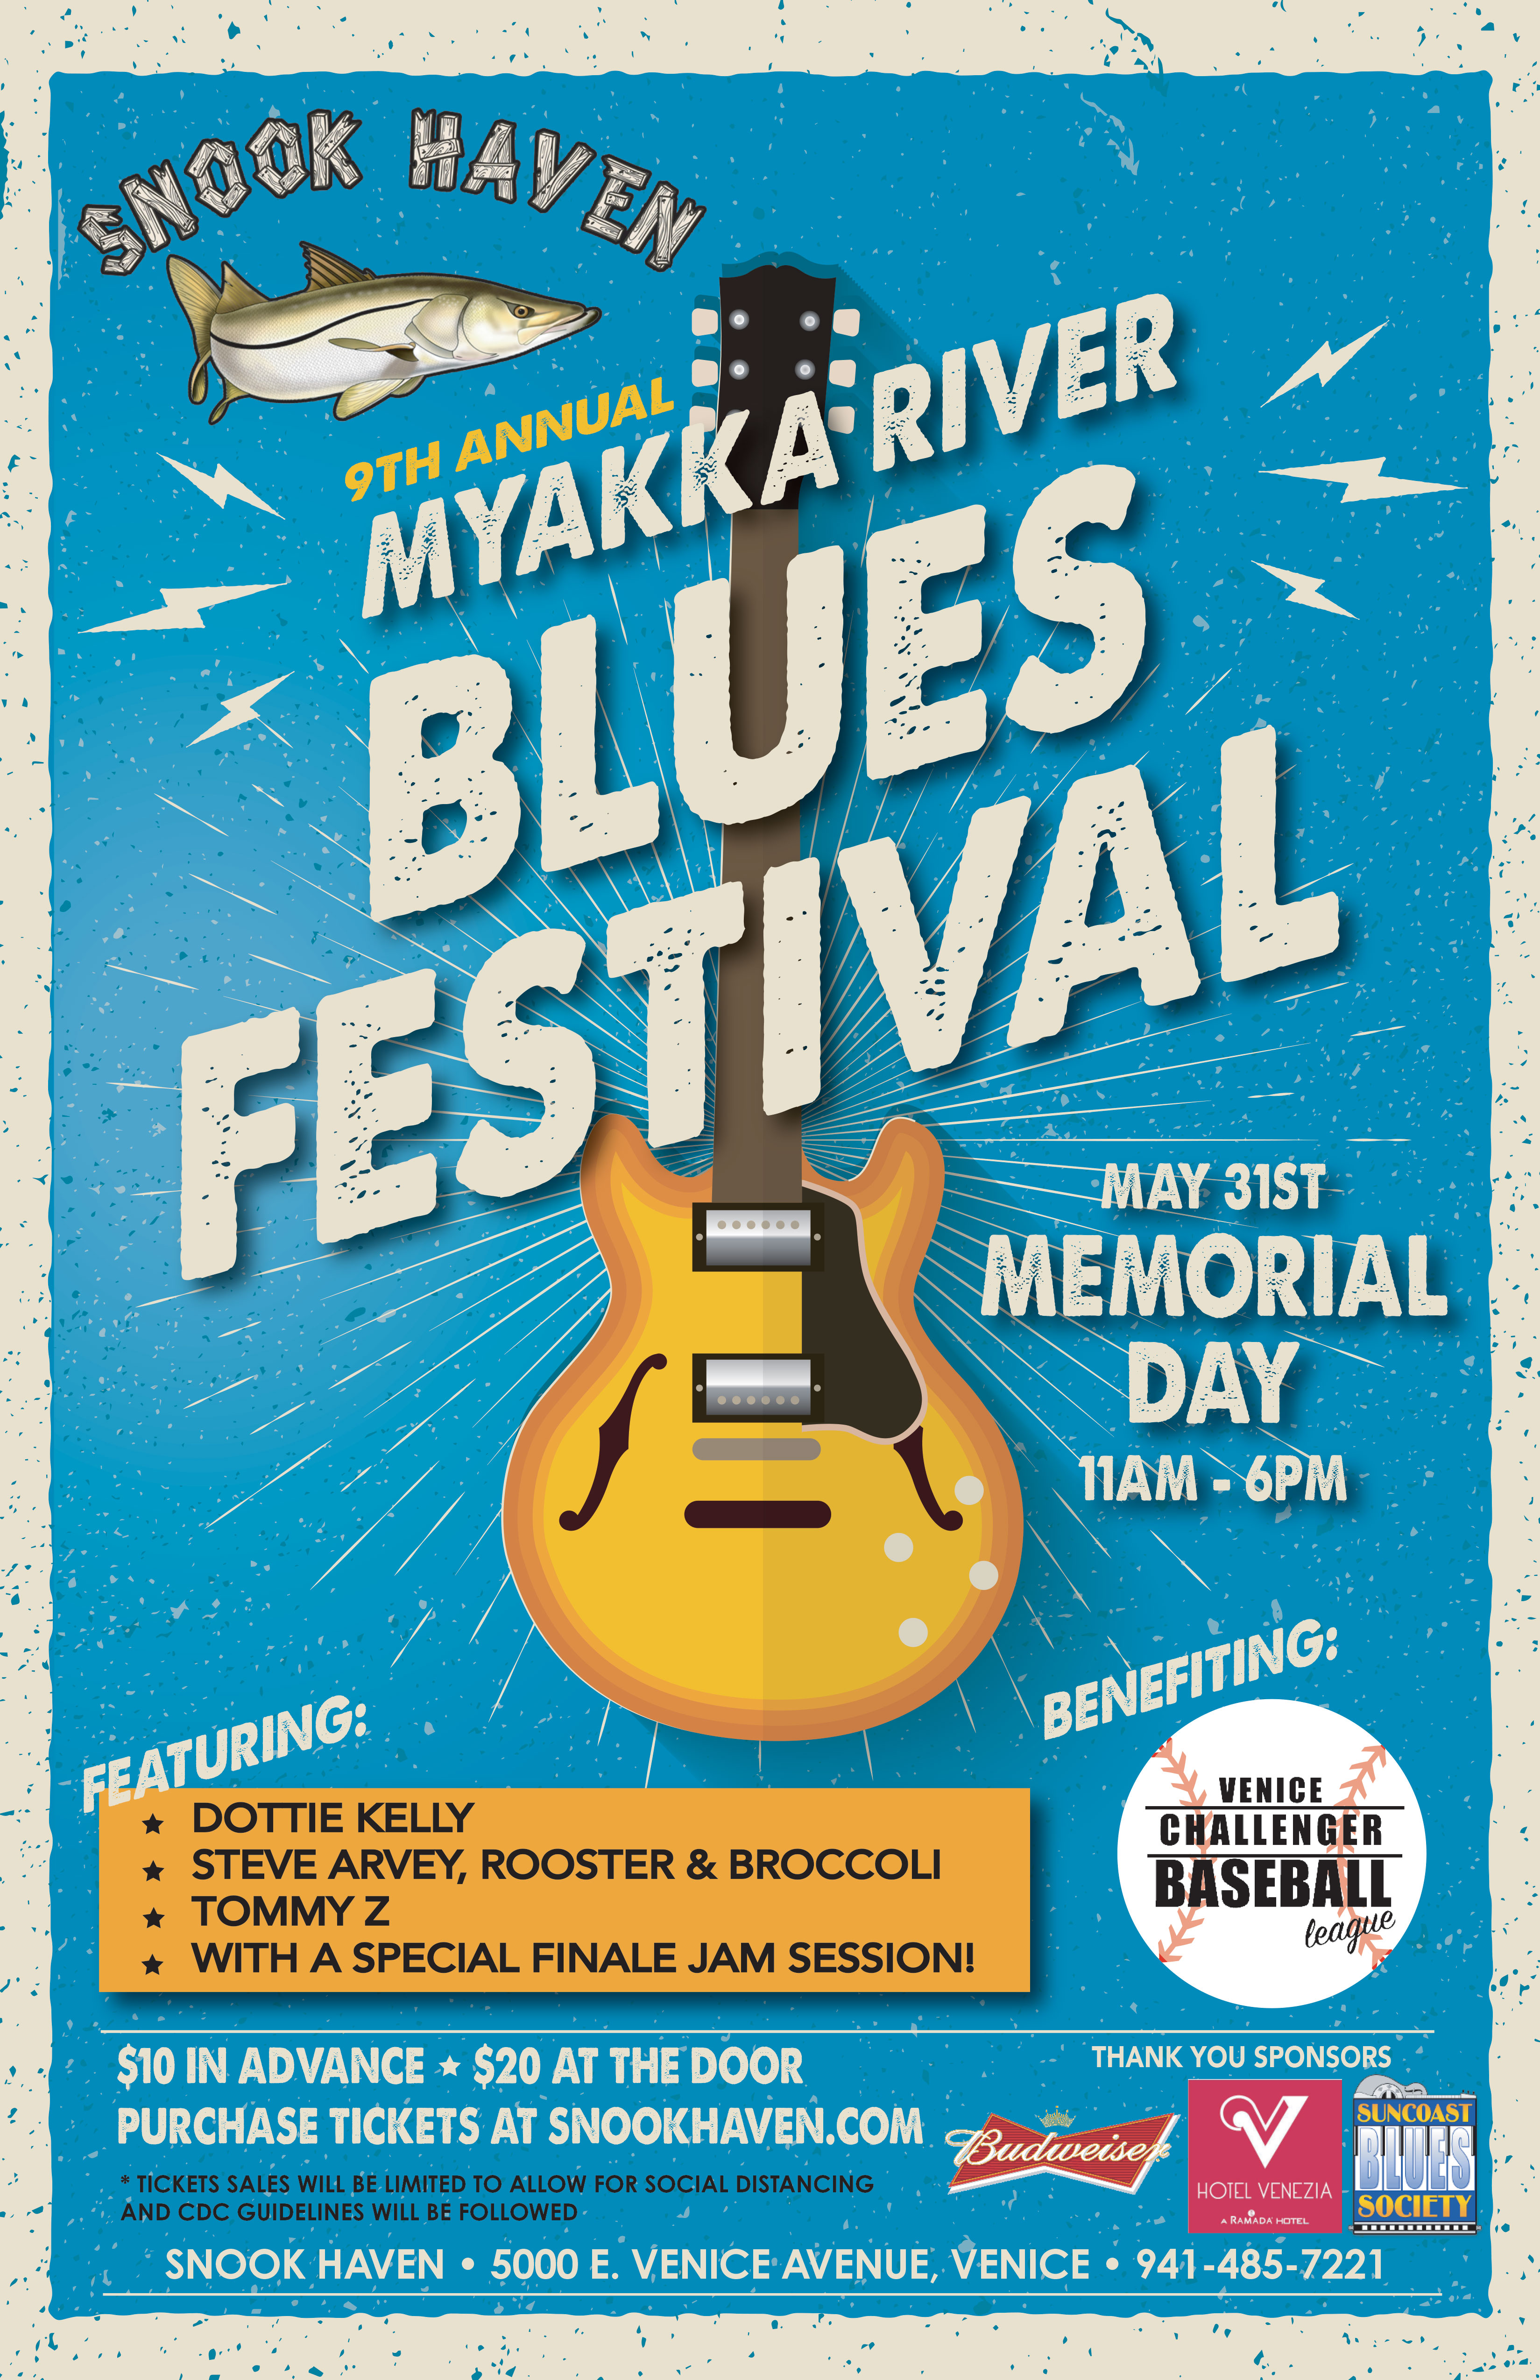 9th Annual Myakka River Blues Festival